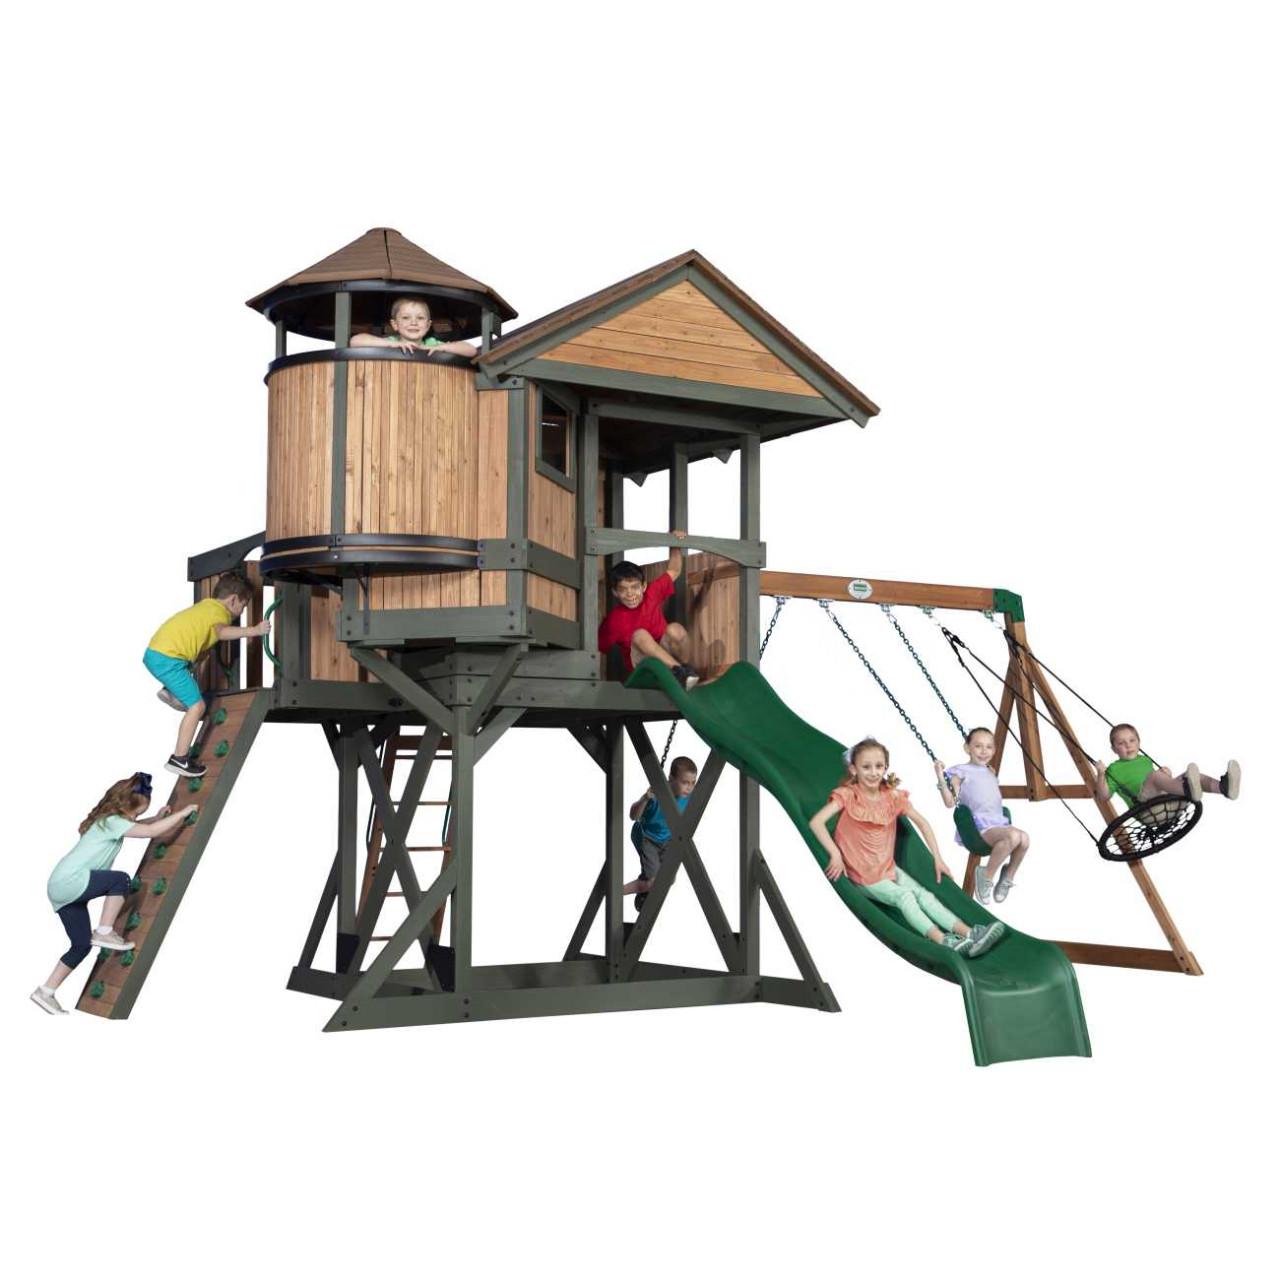 Backyard Spielturm Eagles Nest Elite